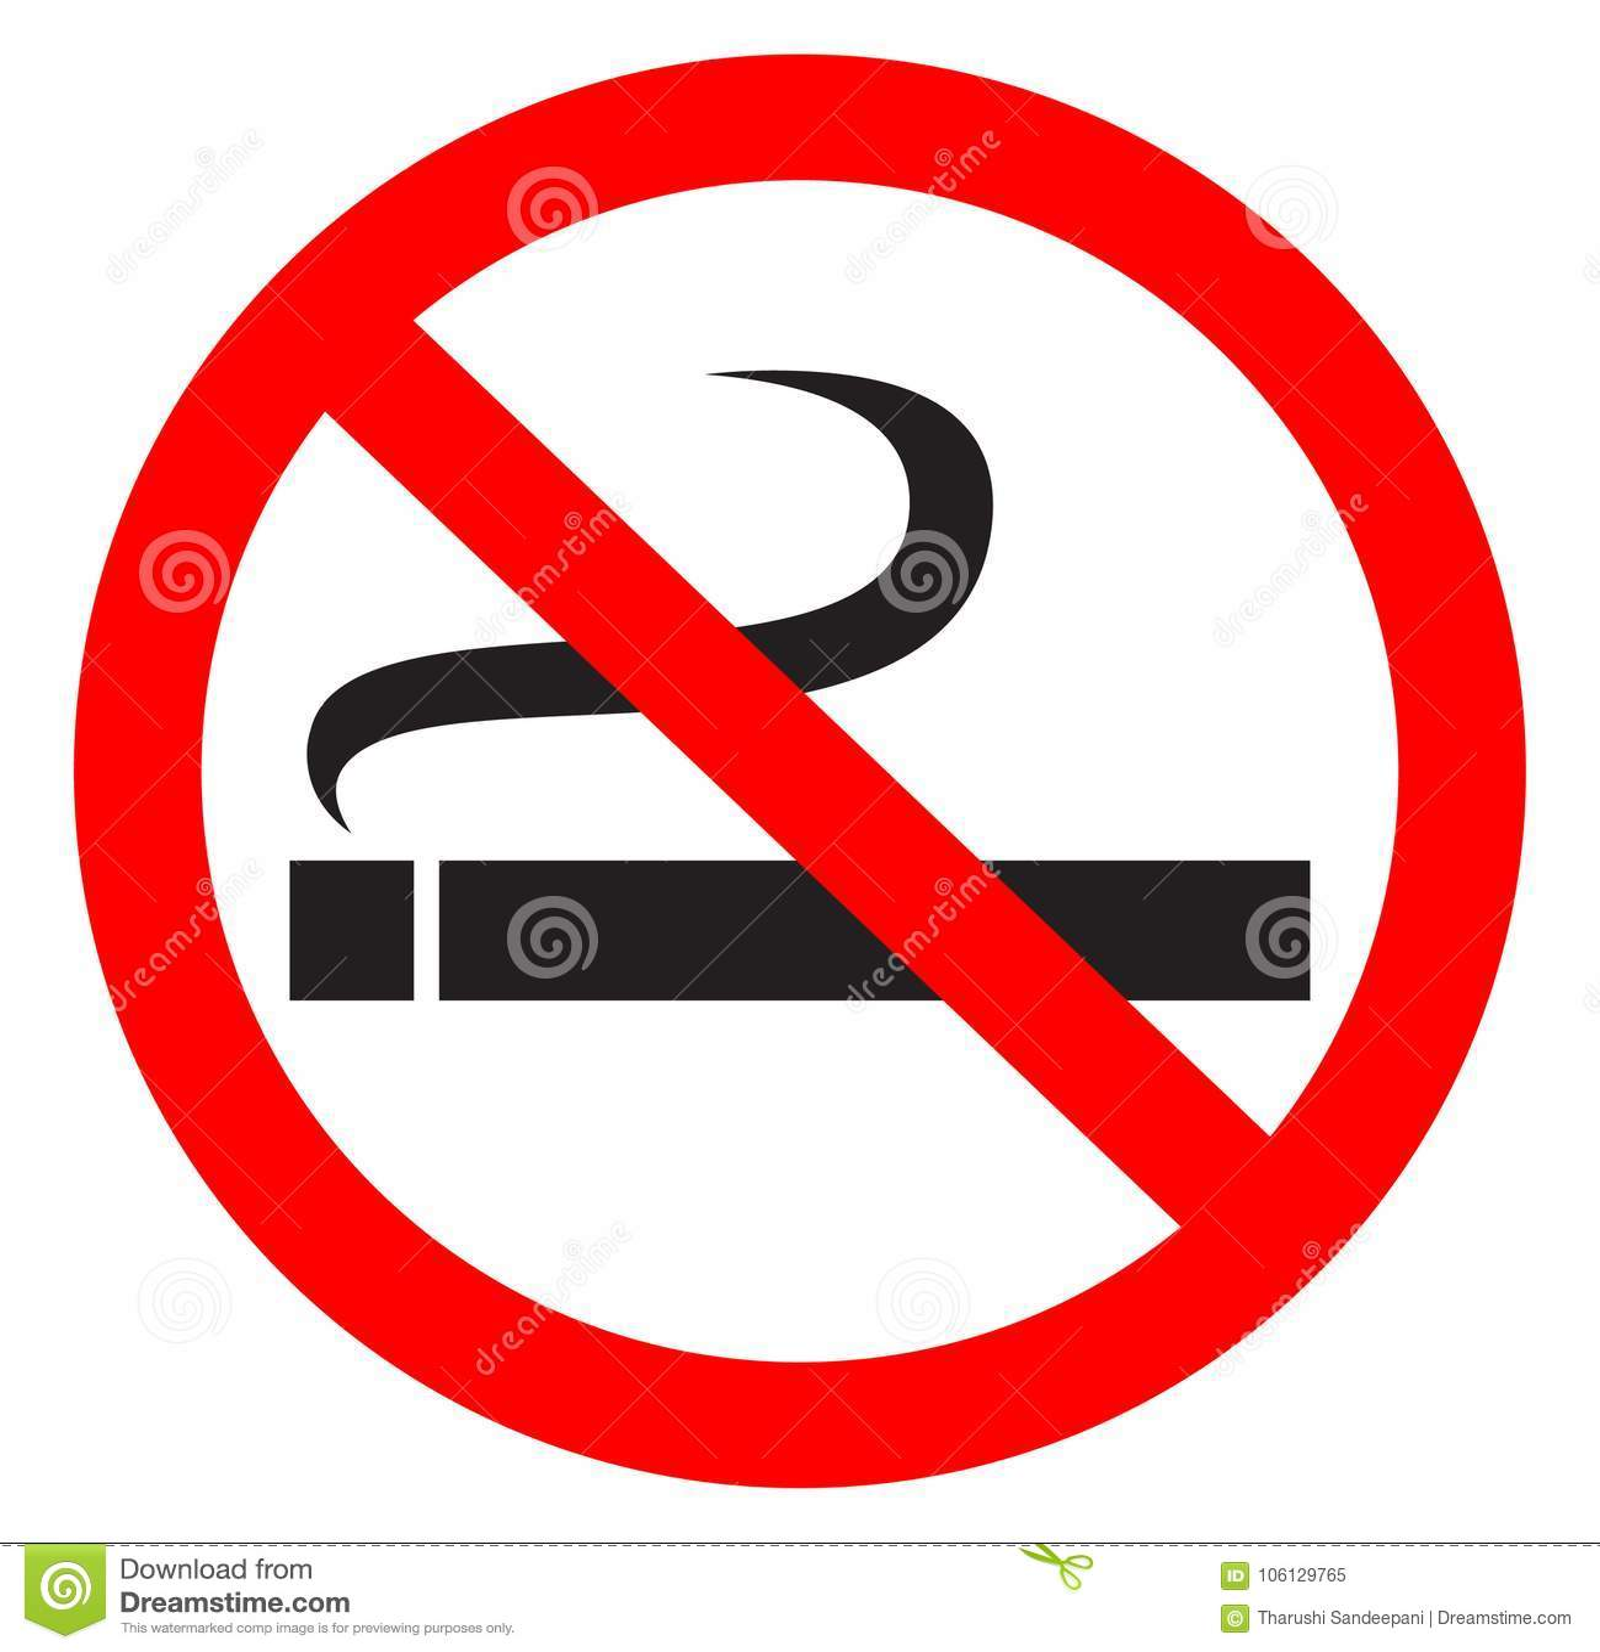 Palenie zabronione symbol